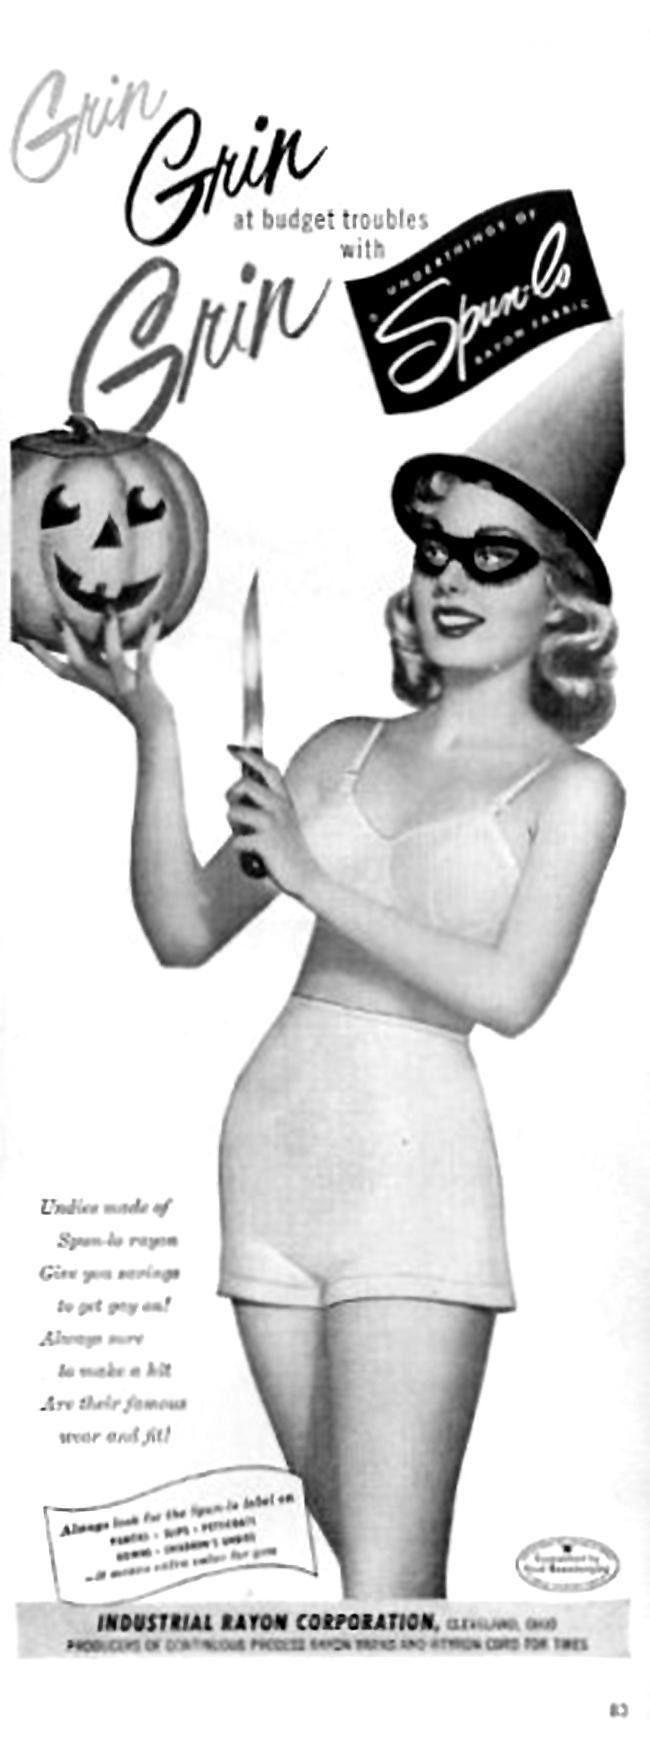 Vintage Halloween Ad - Spun-Lo